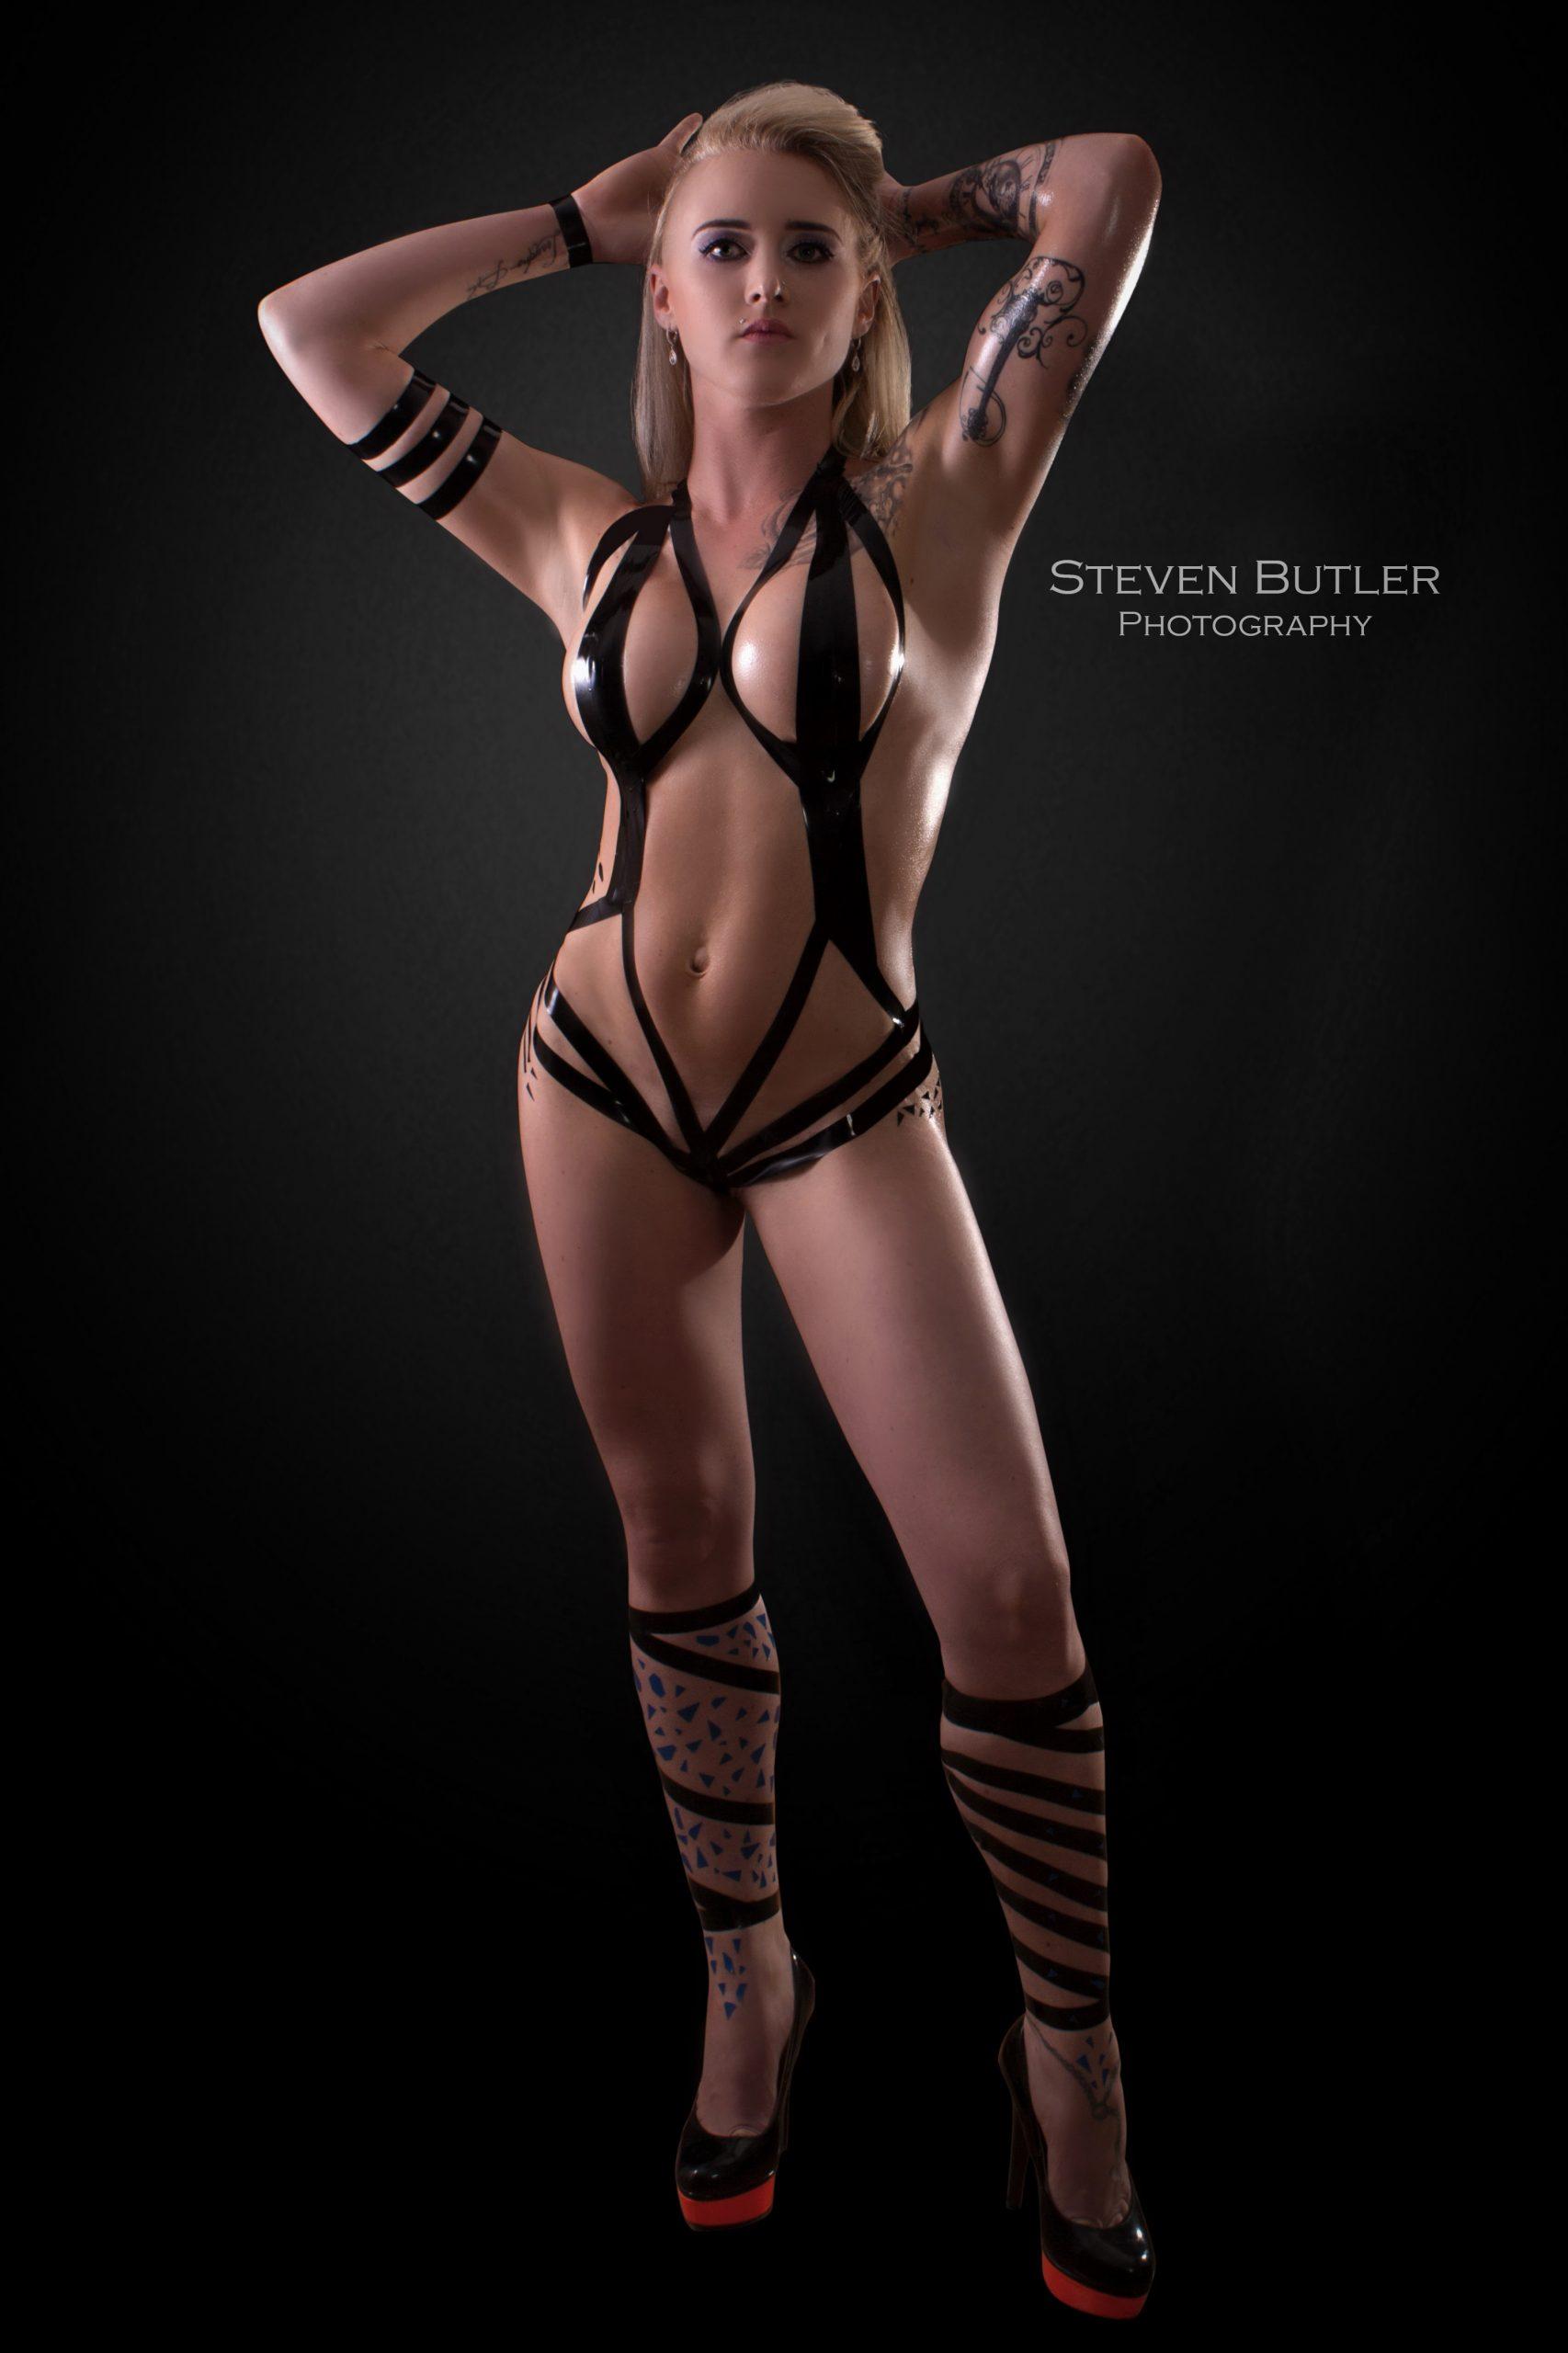 Steven Butler Photography